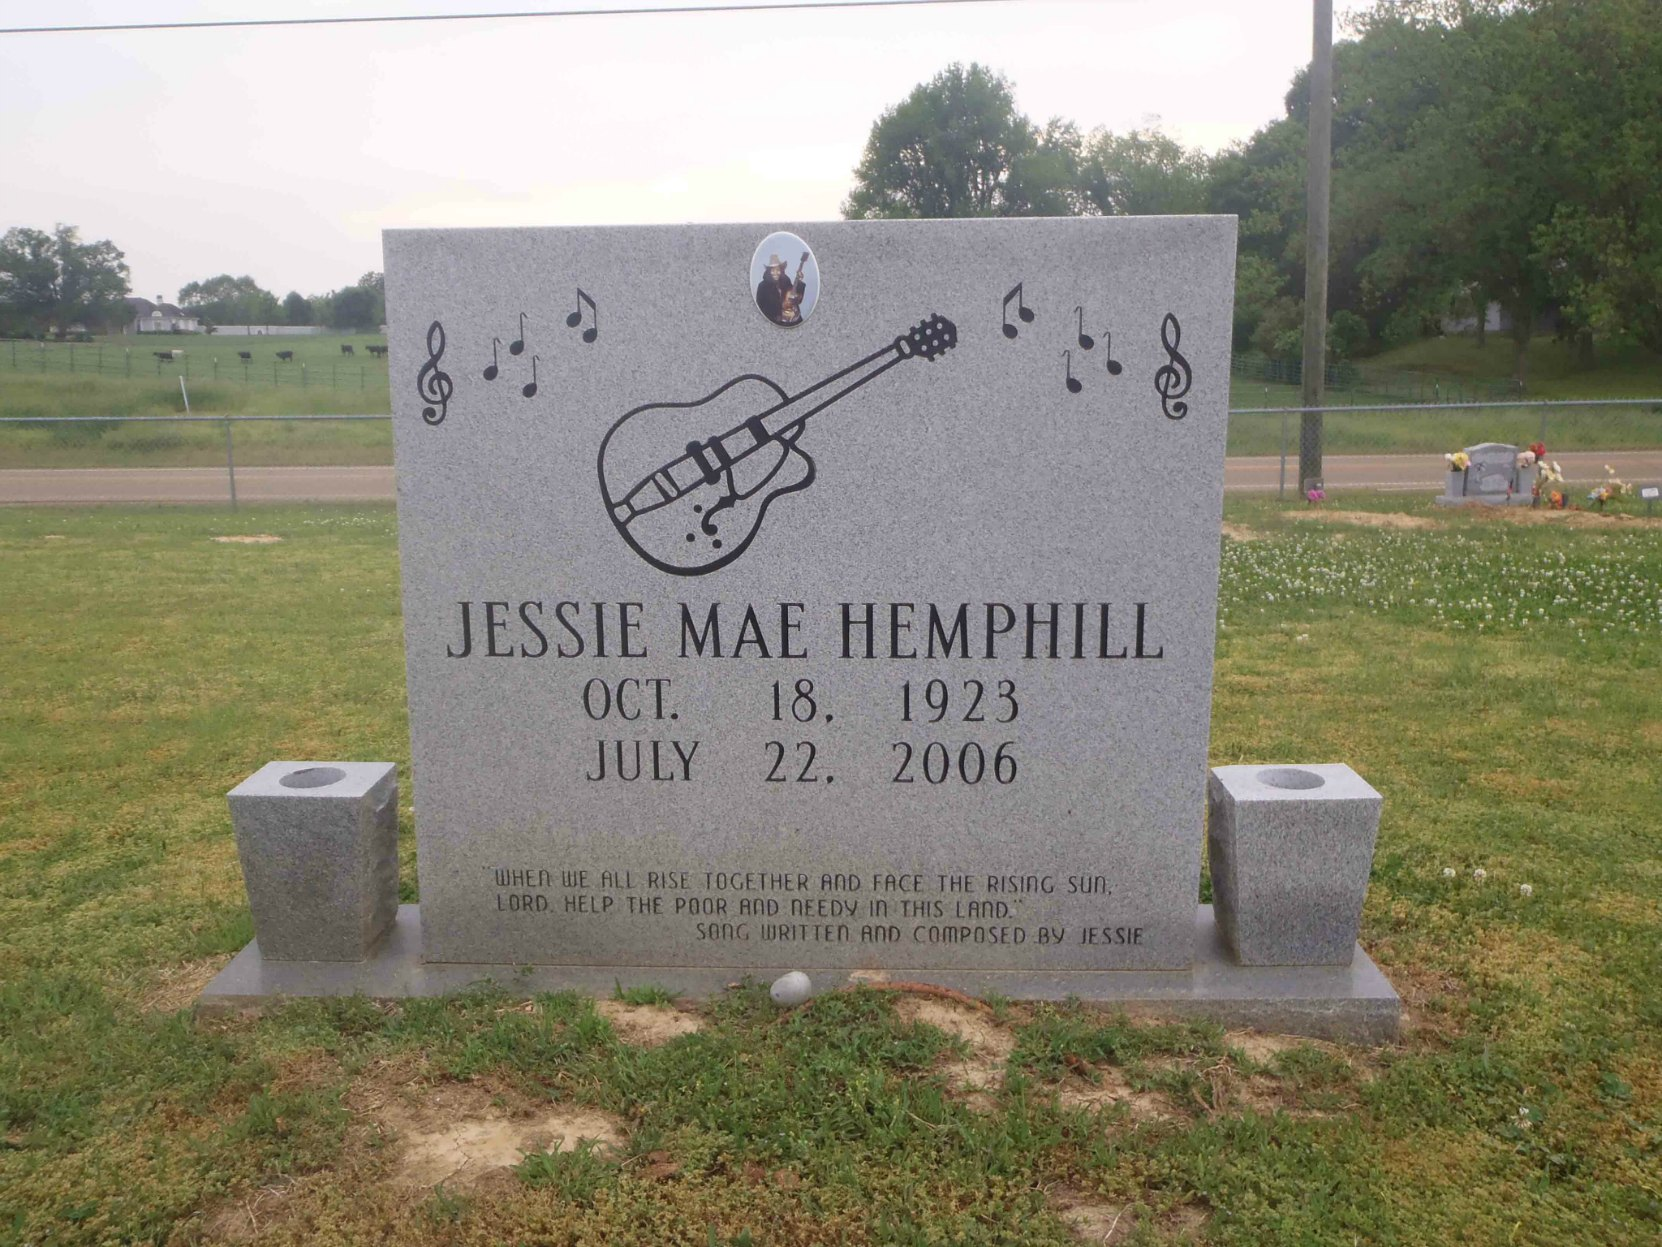 Jessie Mae Hemphill grave, Senatobia Memorial Cemetery, Senatobia, Mississippi.